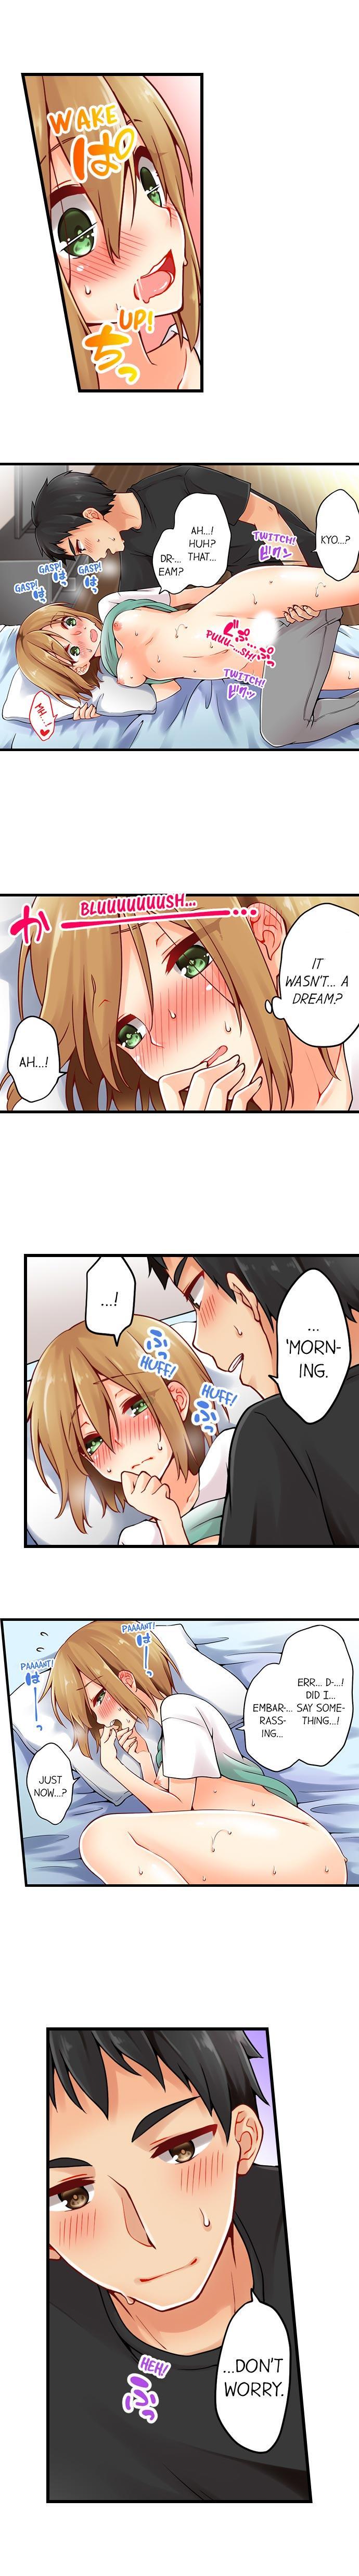 Ren Arisugawa Is Actually A Girl 256